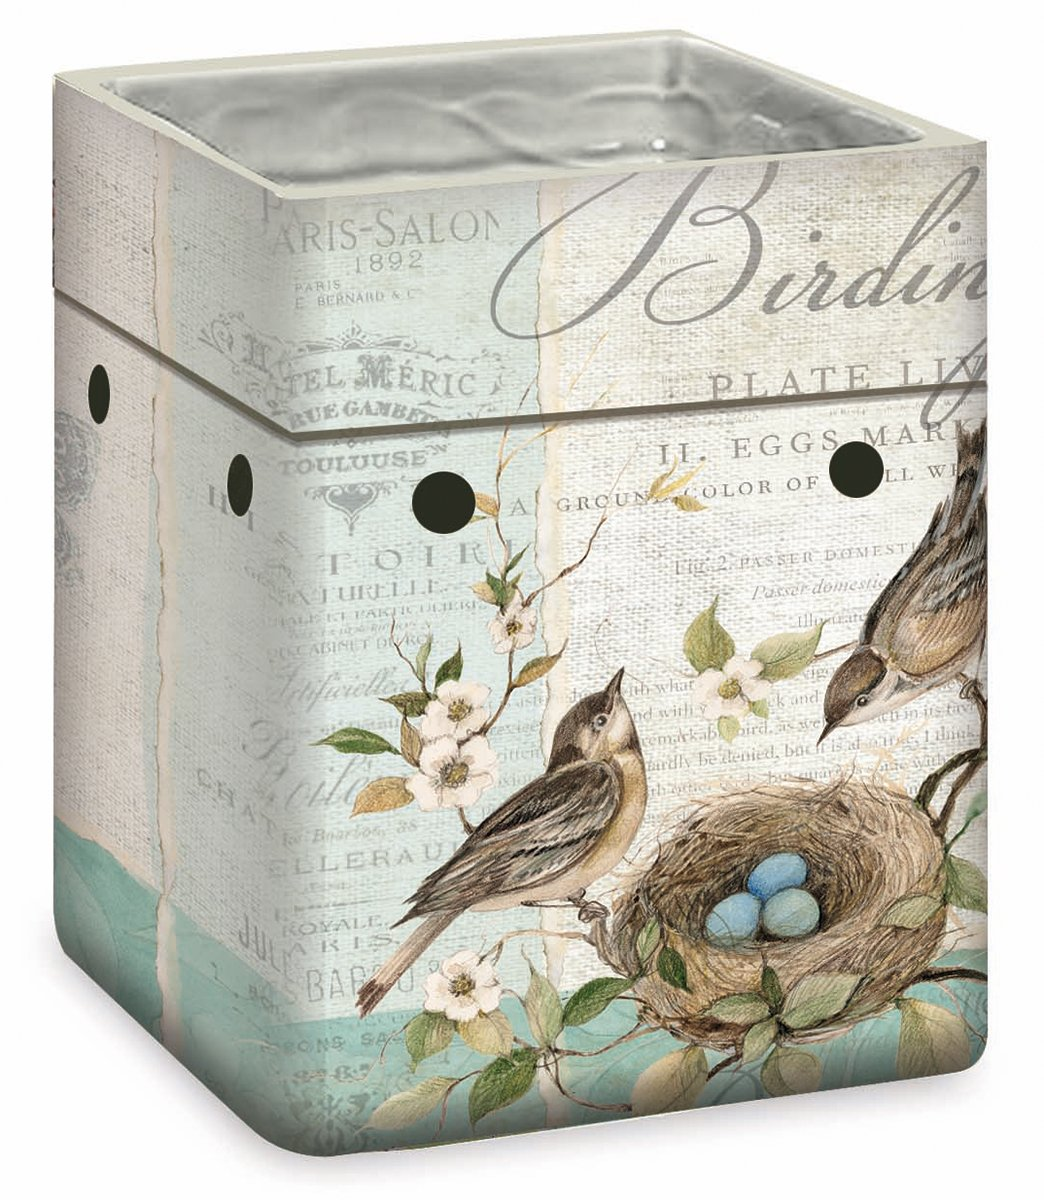 Lang Birding LifeセラミックFragrance Warmer by Susan Winget B0171BWCL0